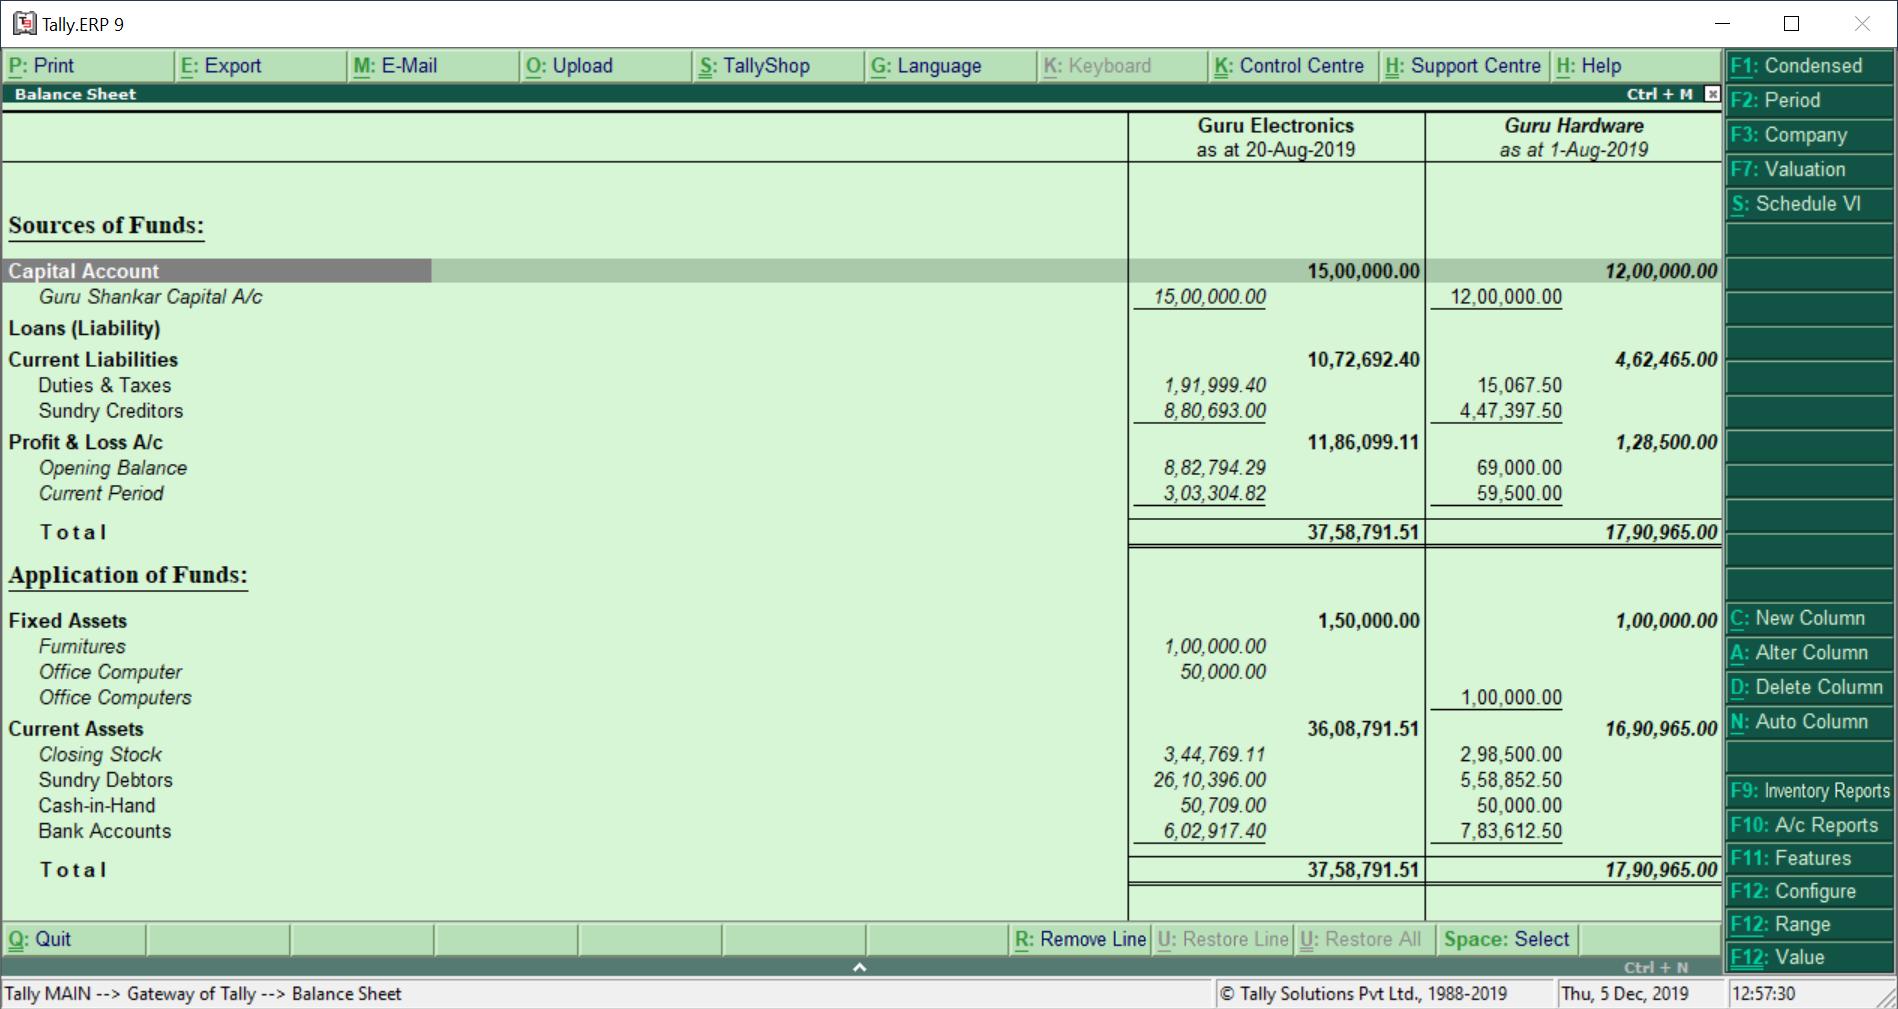 Cross Company Comparative Balance Sheet